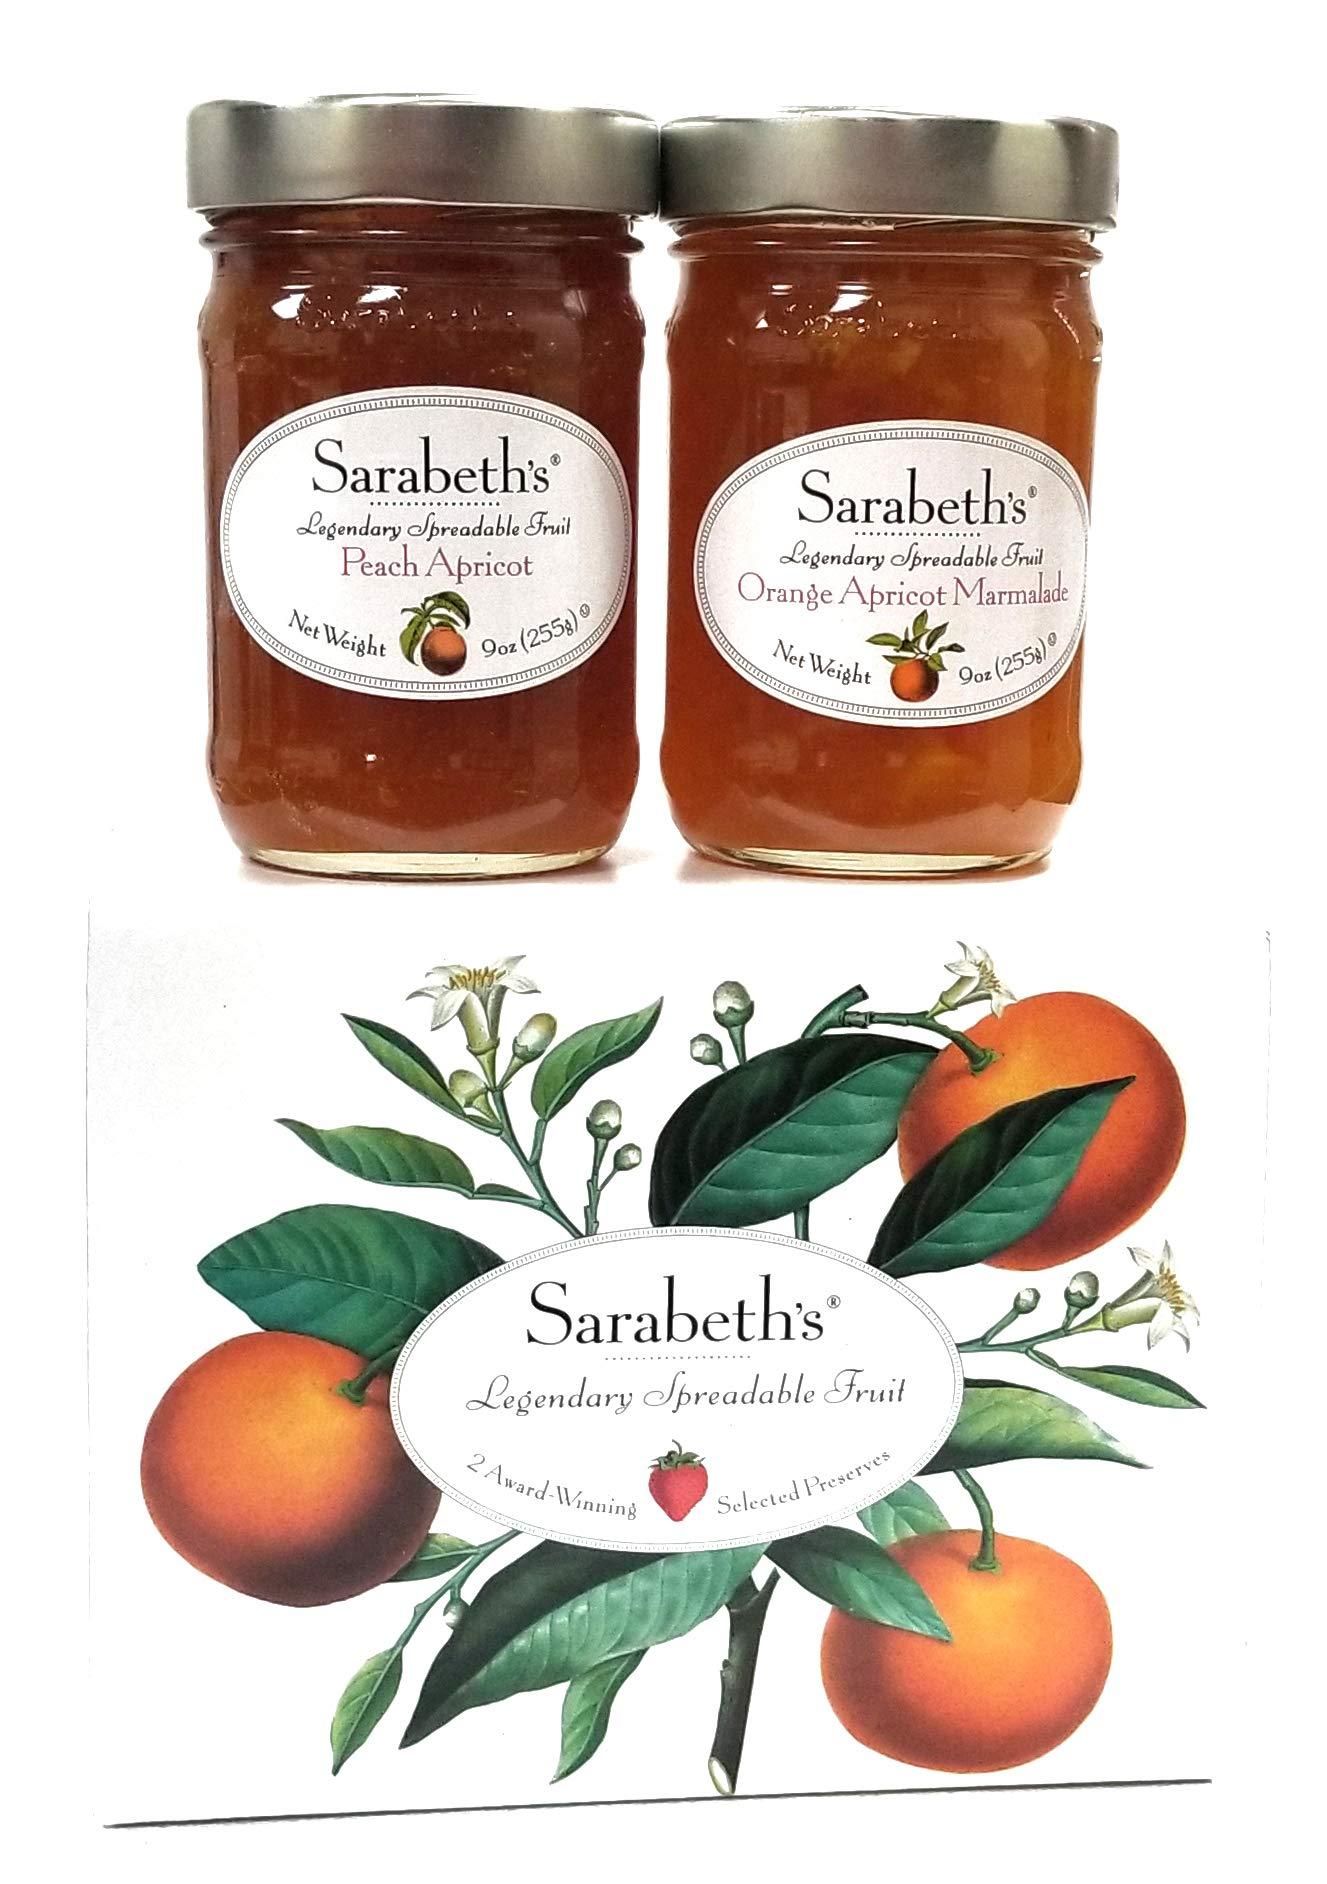 Sarabeth's Two Jar Gift Box Set - Two 9 oz. jars - Peach Apricot & Orange Apricot Marmalade by Sarabeth's